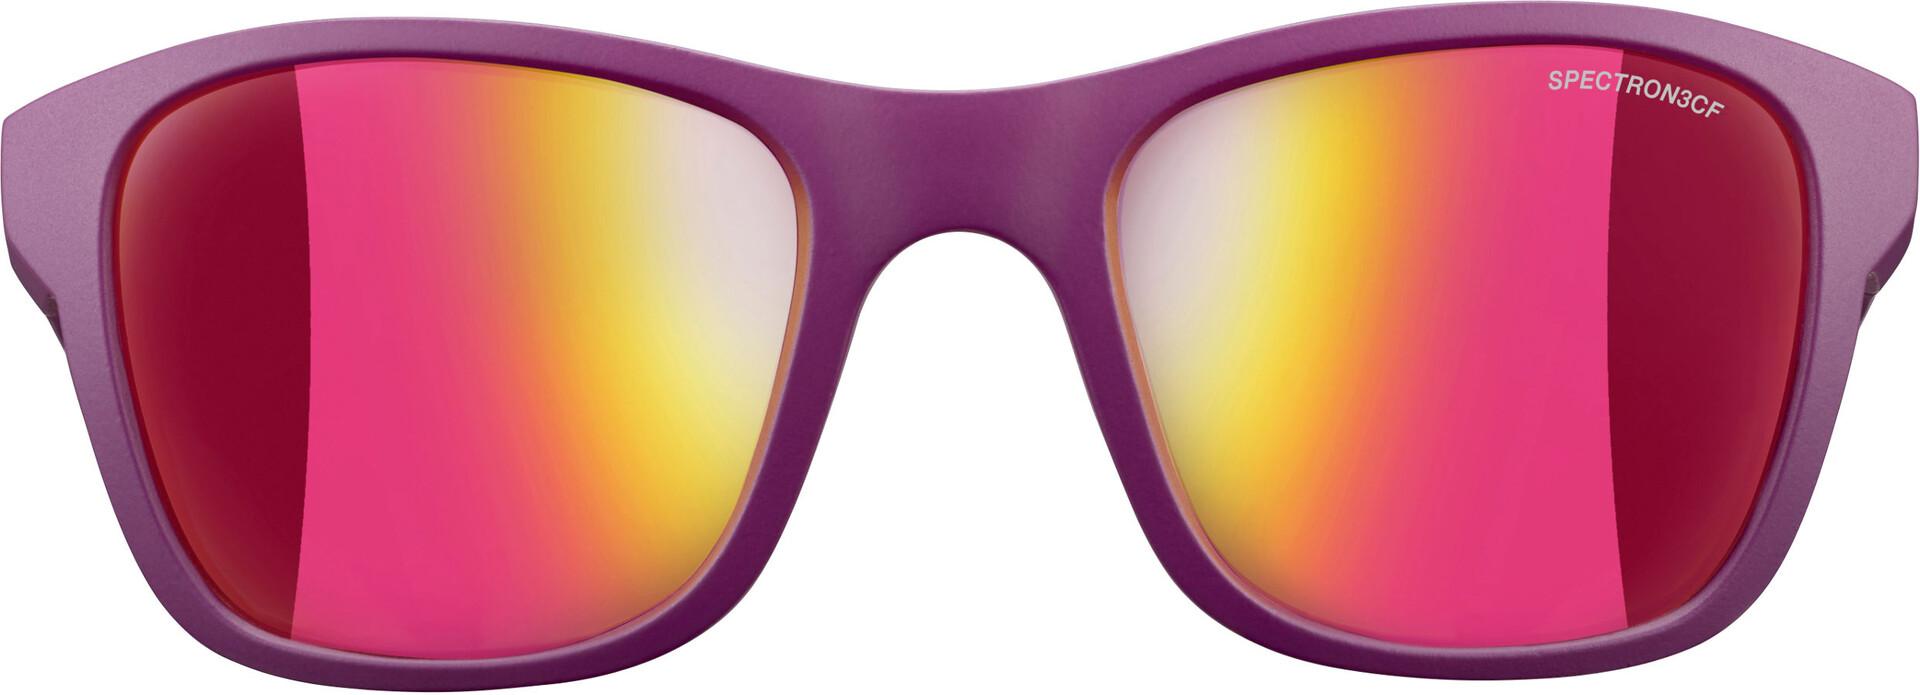 Julbo Reach Spectron 3CF Solbriller 6 10Y Børn, matt purple multilayer pink